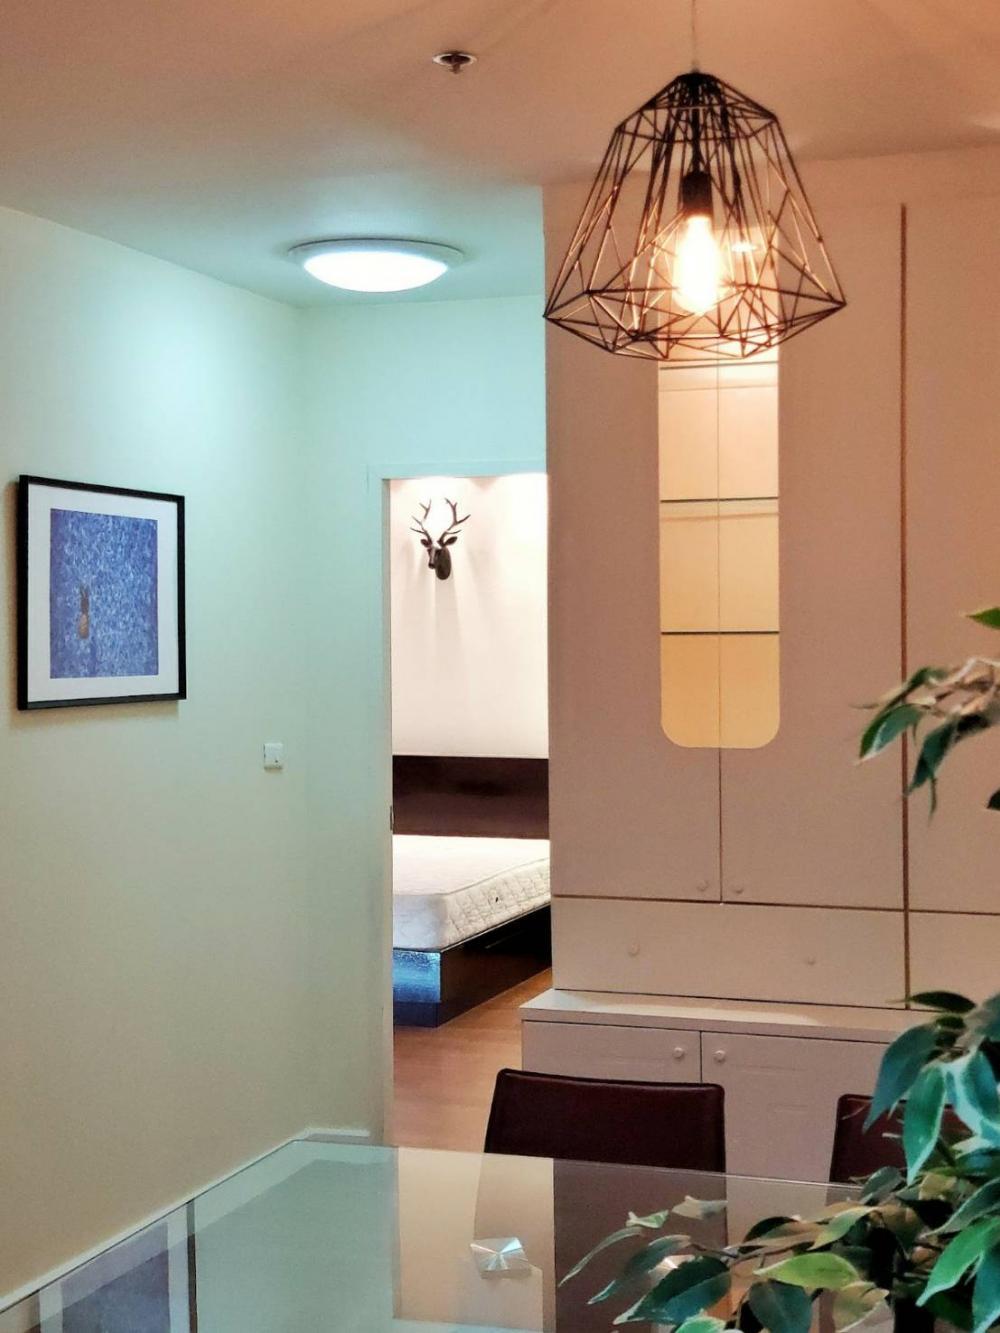 For RentCondoSukhumvit, Asoke, Thonglor : Rent 2 bed 2 bath 70 sq.m for 23,500.-